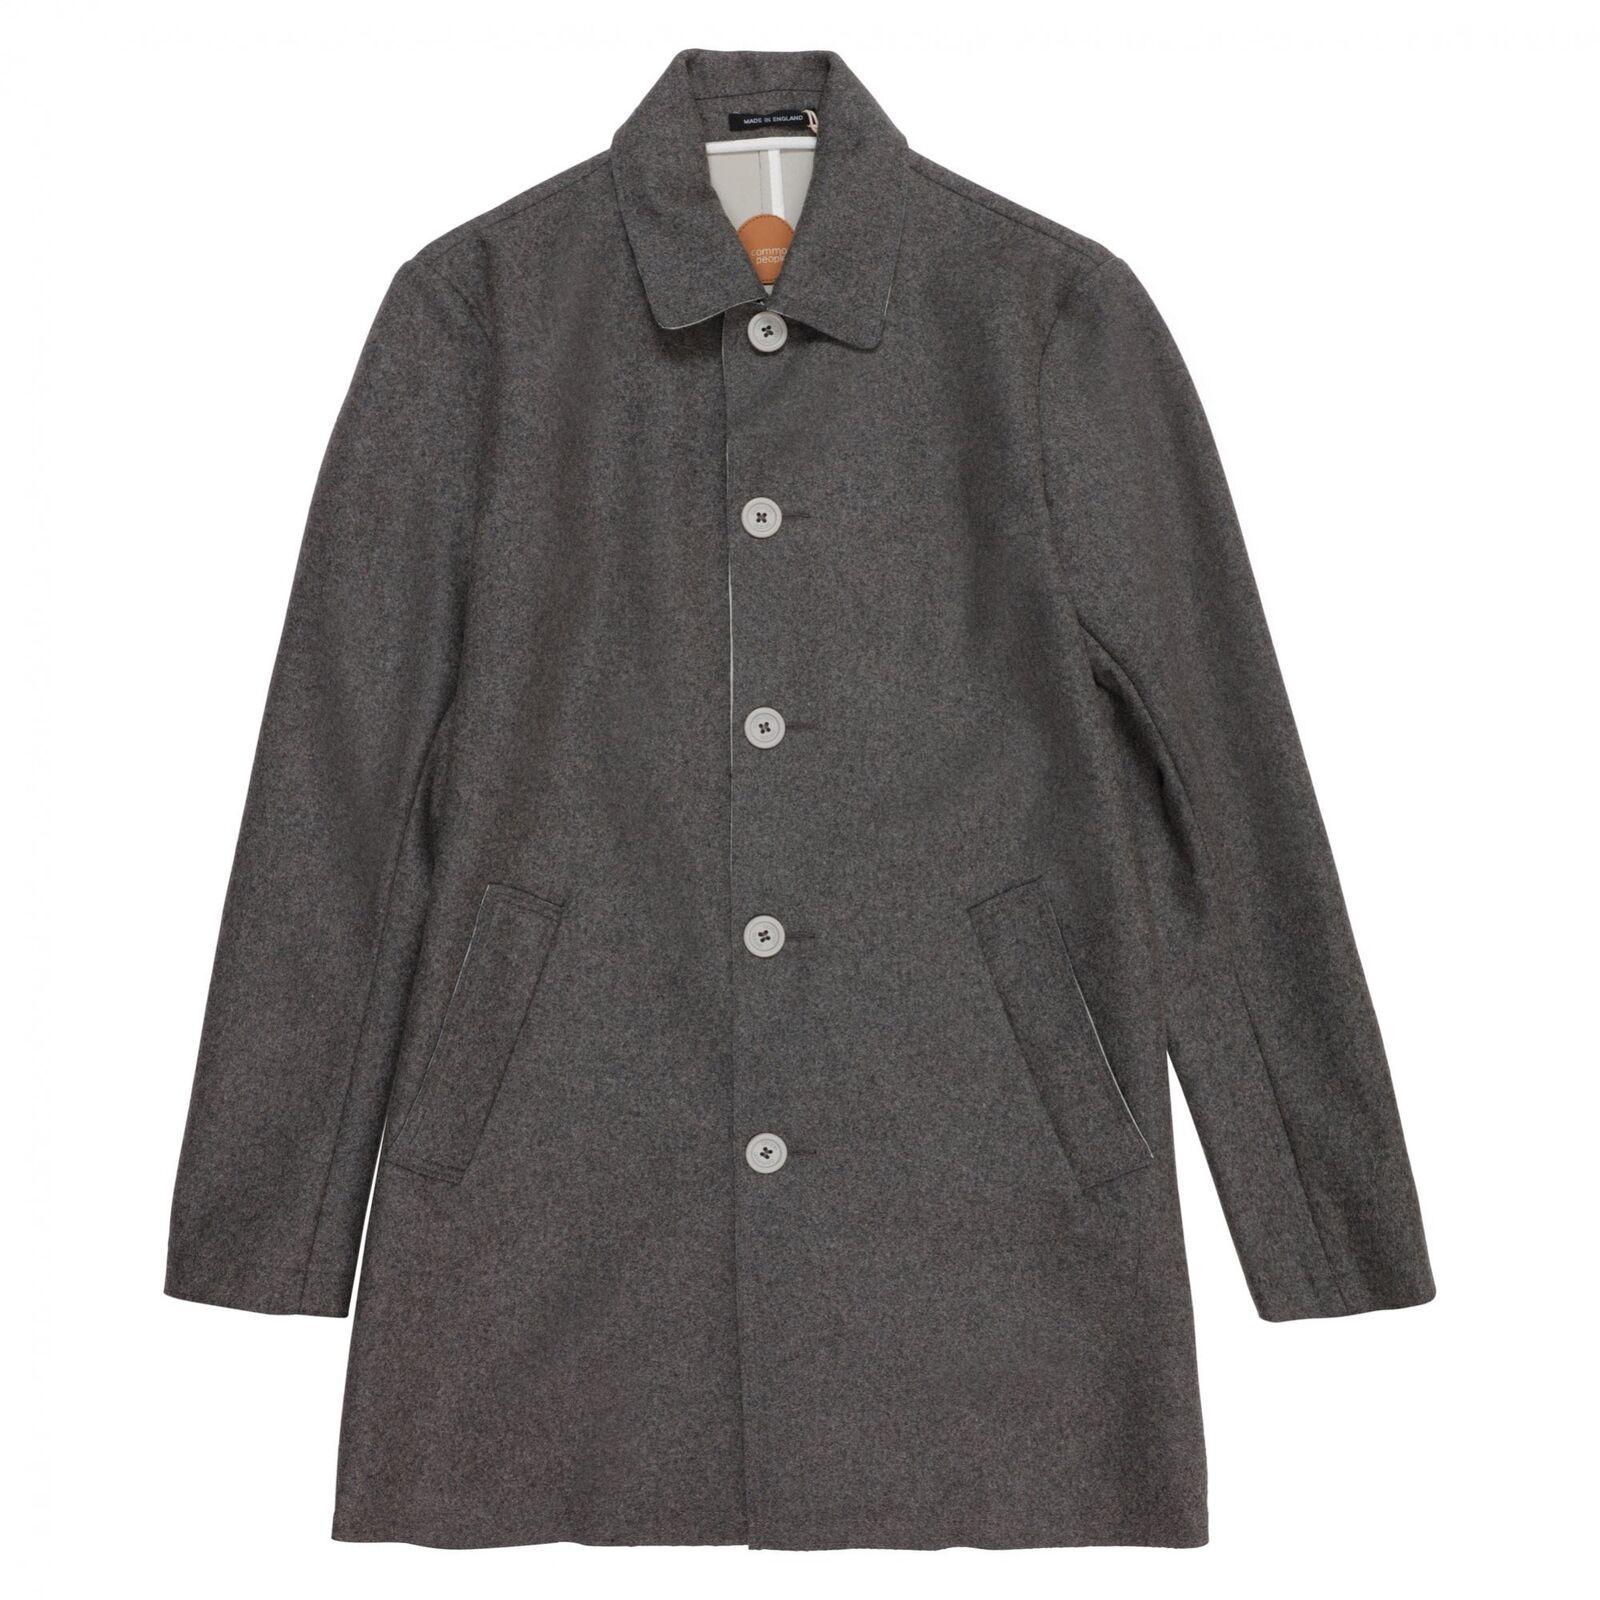 dc2e78174 Chalke RAW Edge Mac People Common nyrxvv6806-Coats & Jackets - www ...